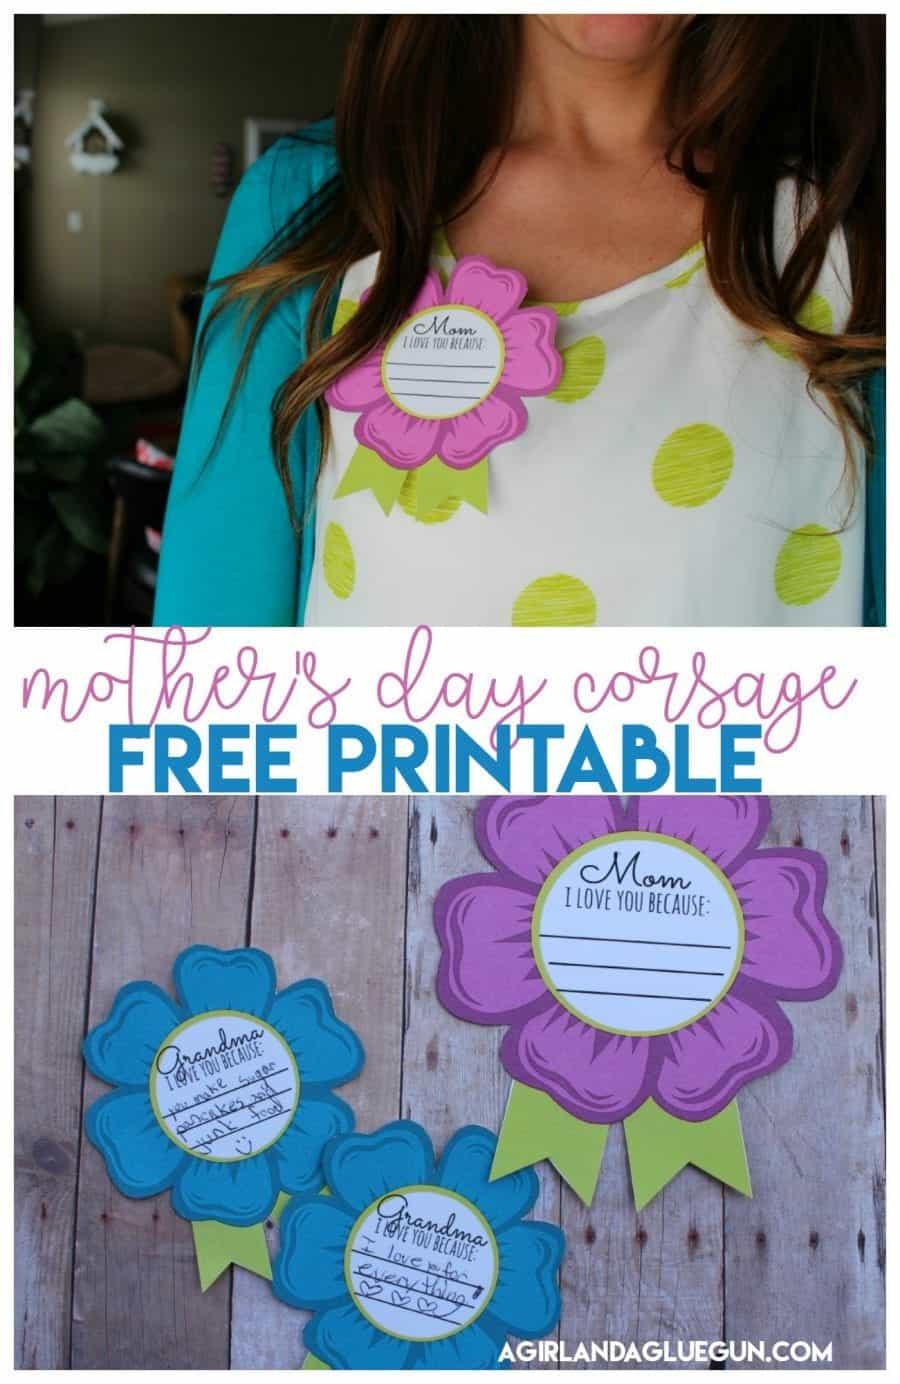 mom and grandma badges free printable a girl and a glue gun